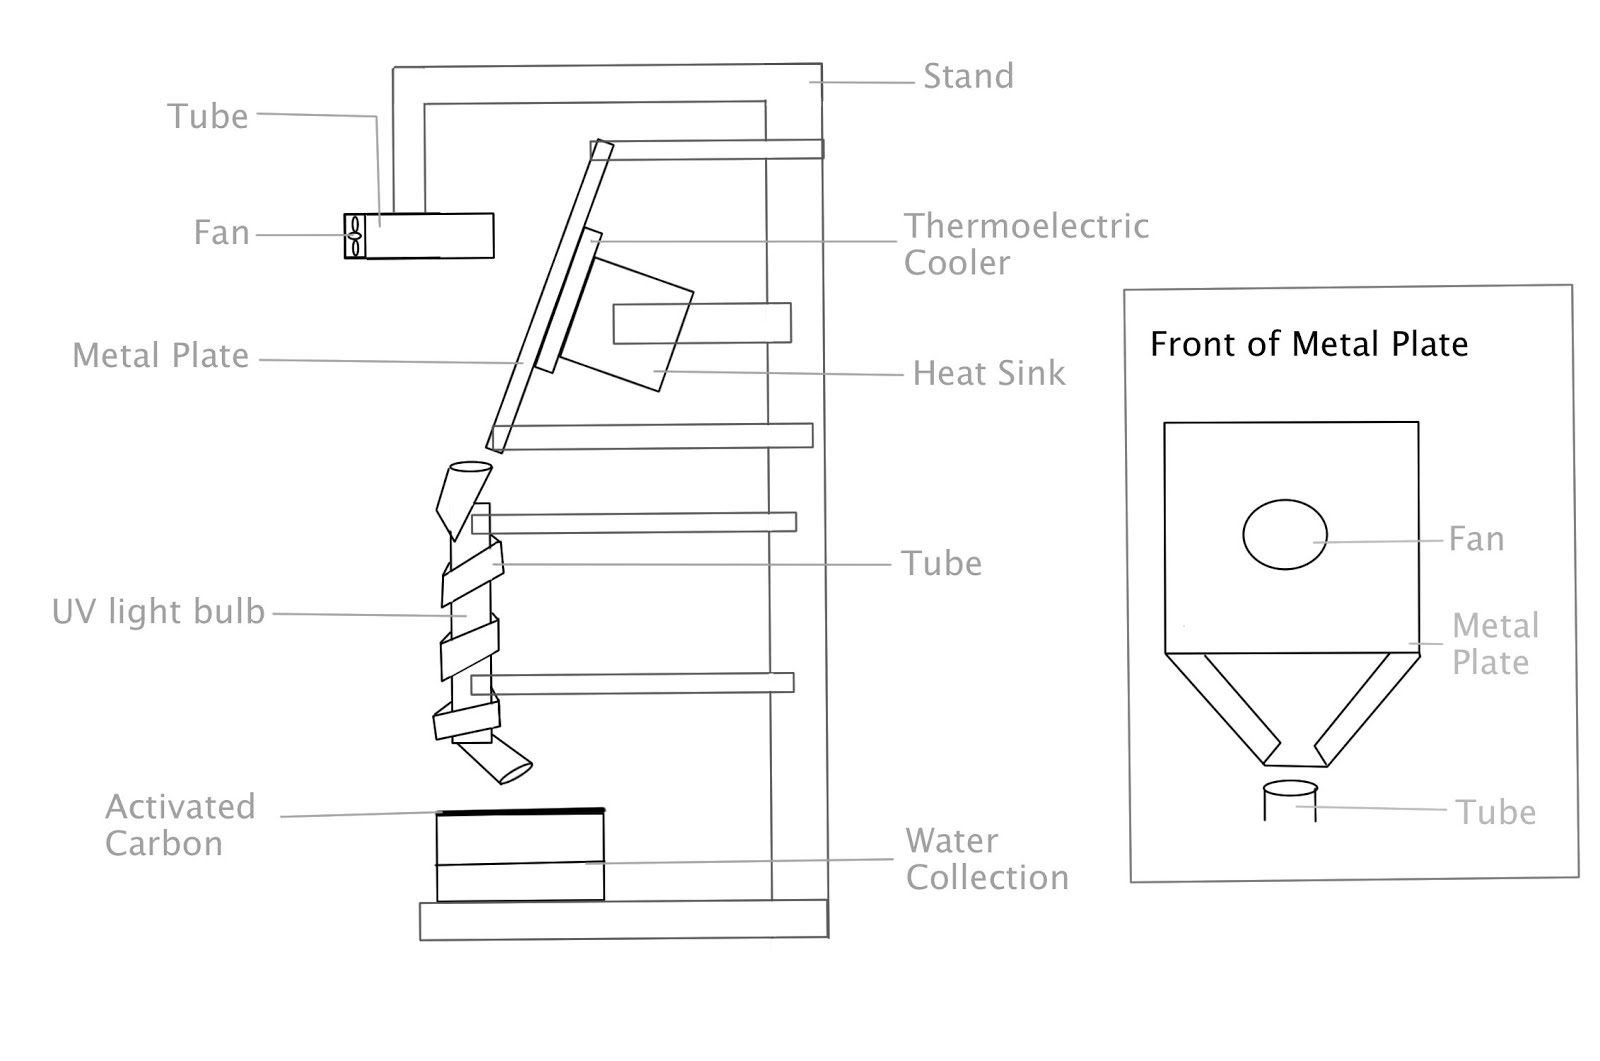 ISS_Diagram1.jpg